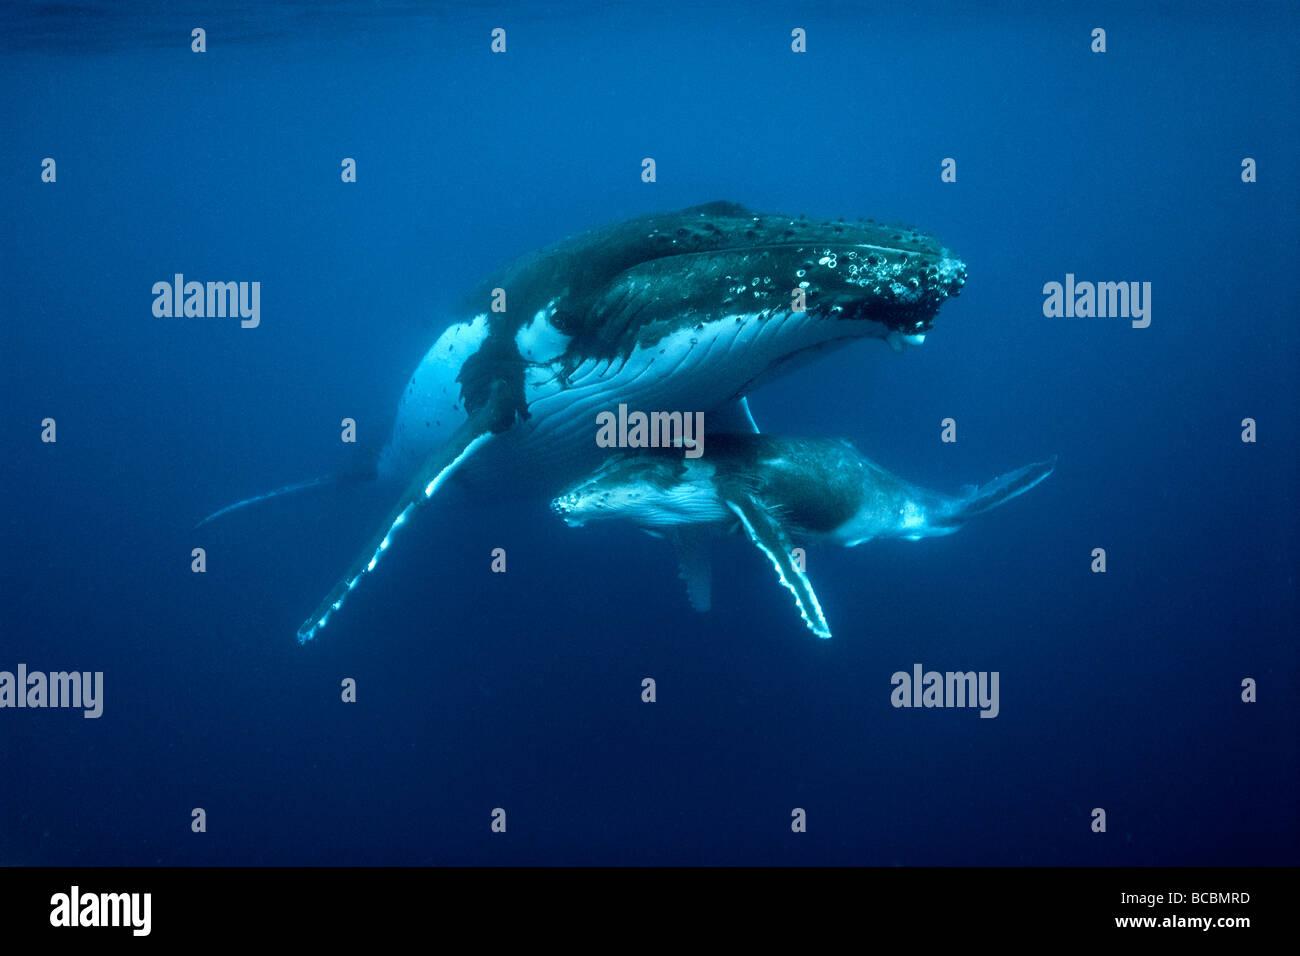 Ballenas jorobadas Imagen De Stock